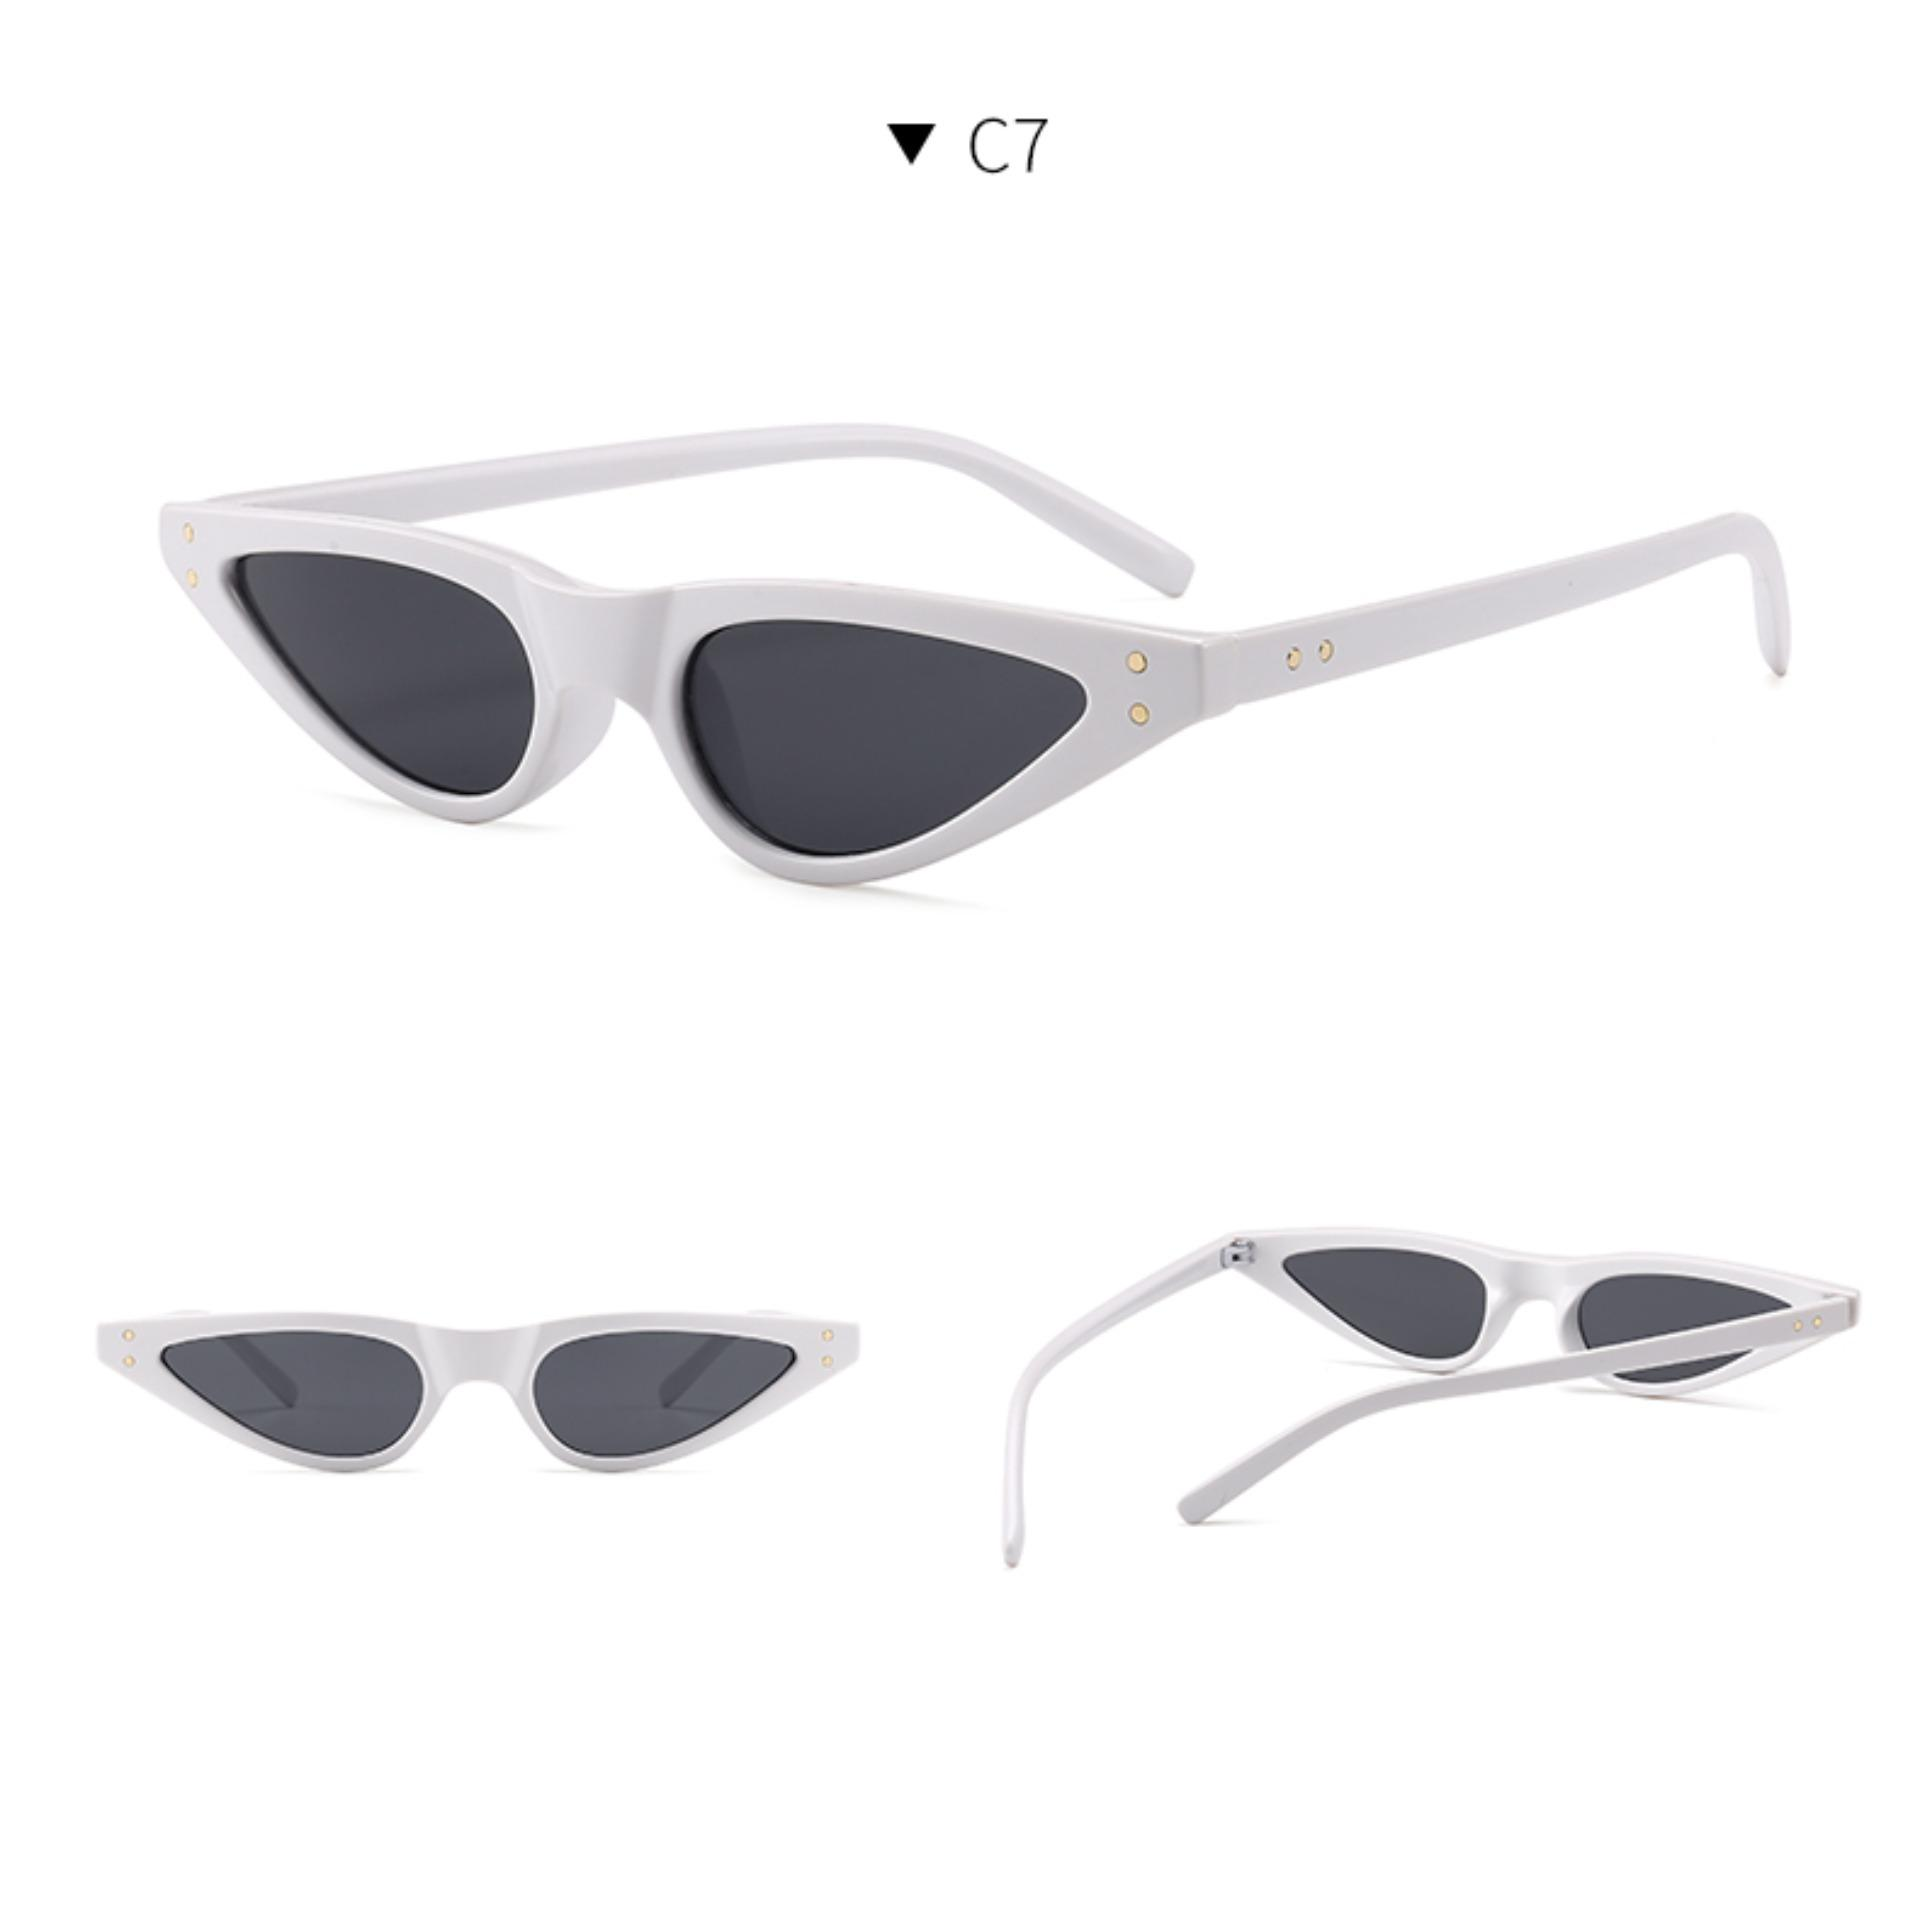 Vintage Cat Eye Design Sunglasses CAT9792 - Kacamata Fashion Wanita -  Kucing - Best Seller abadbc929f